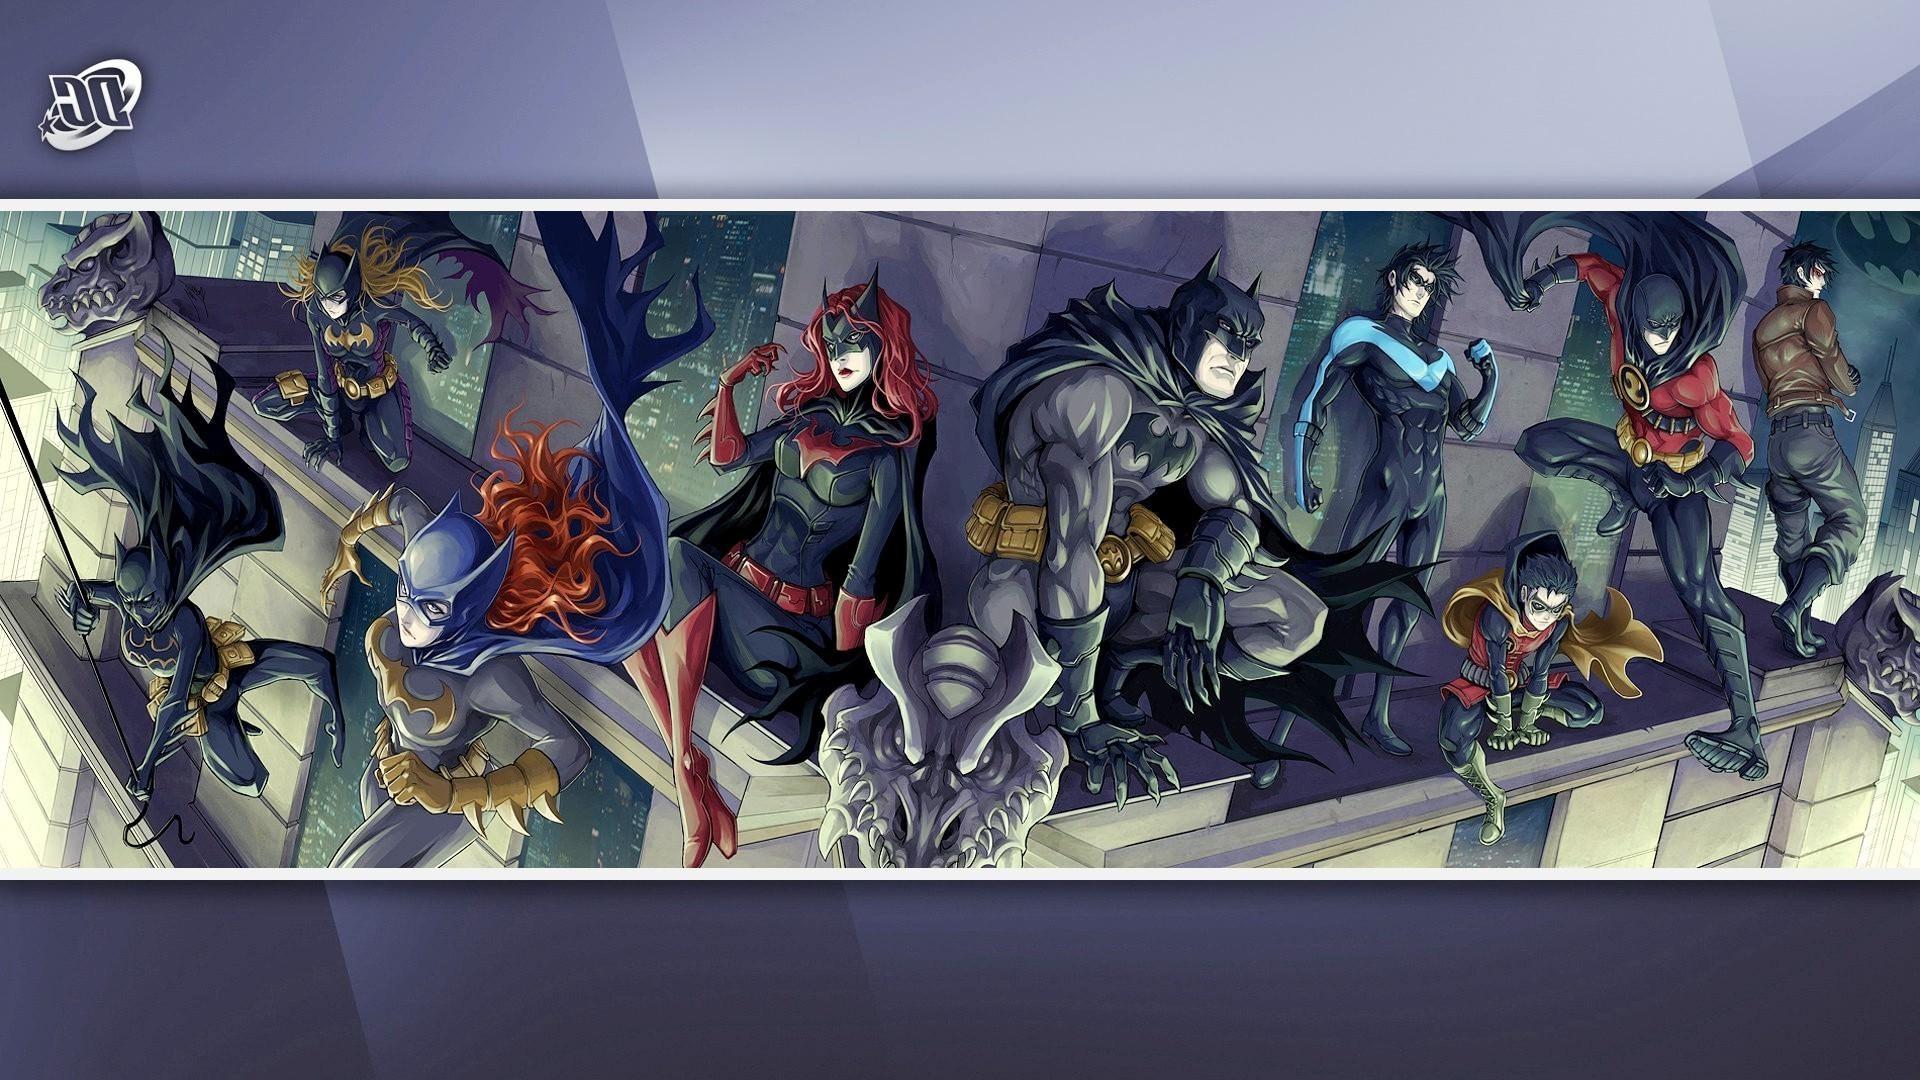 DC Comics, Batman, Nightwing, Batgirl, Batwoman, Red Robin, Red Hood, Robin  III Wallpapers HD / Desktop and Mobile Backgrounds